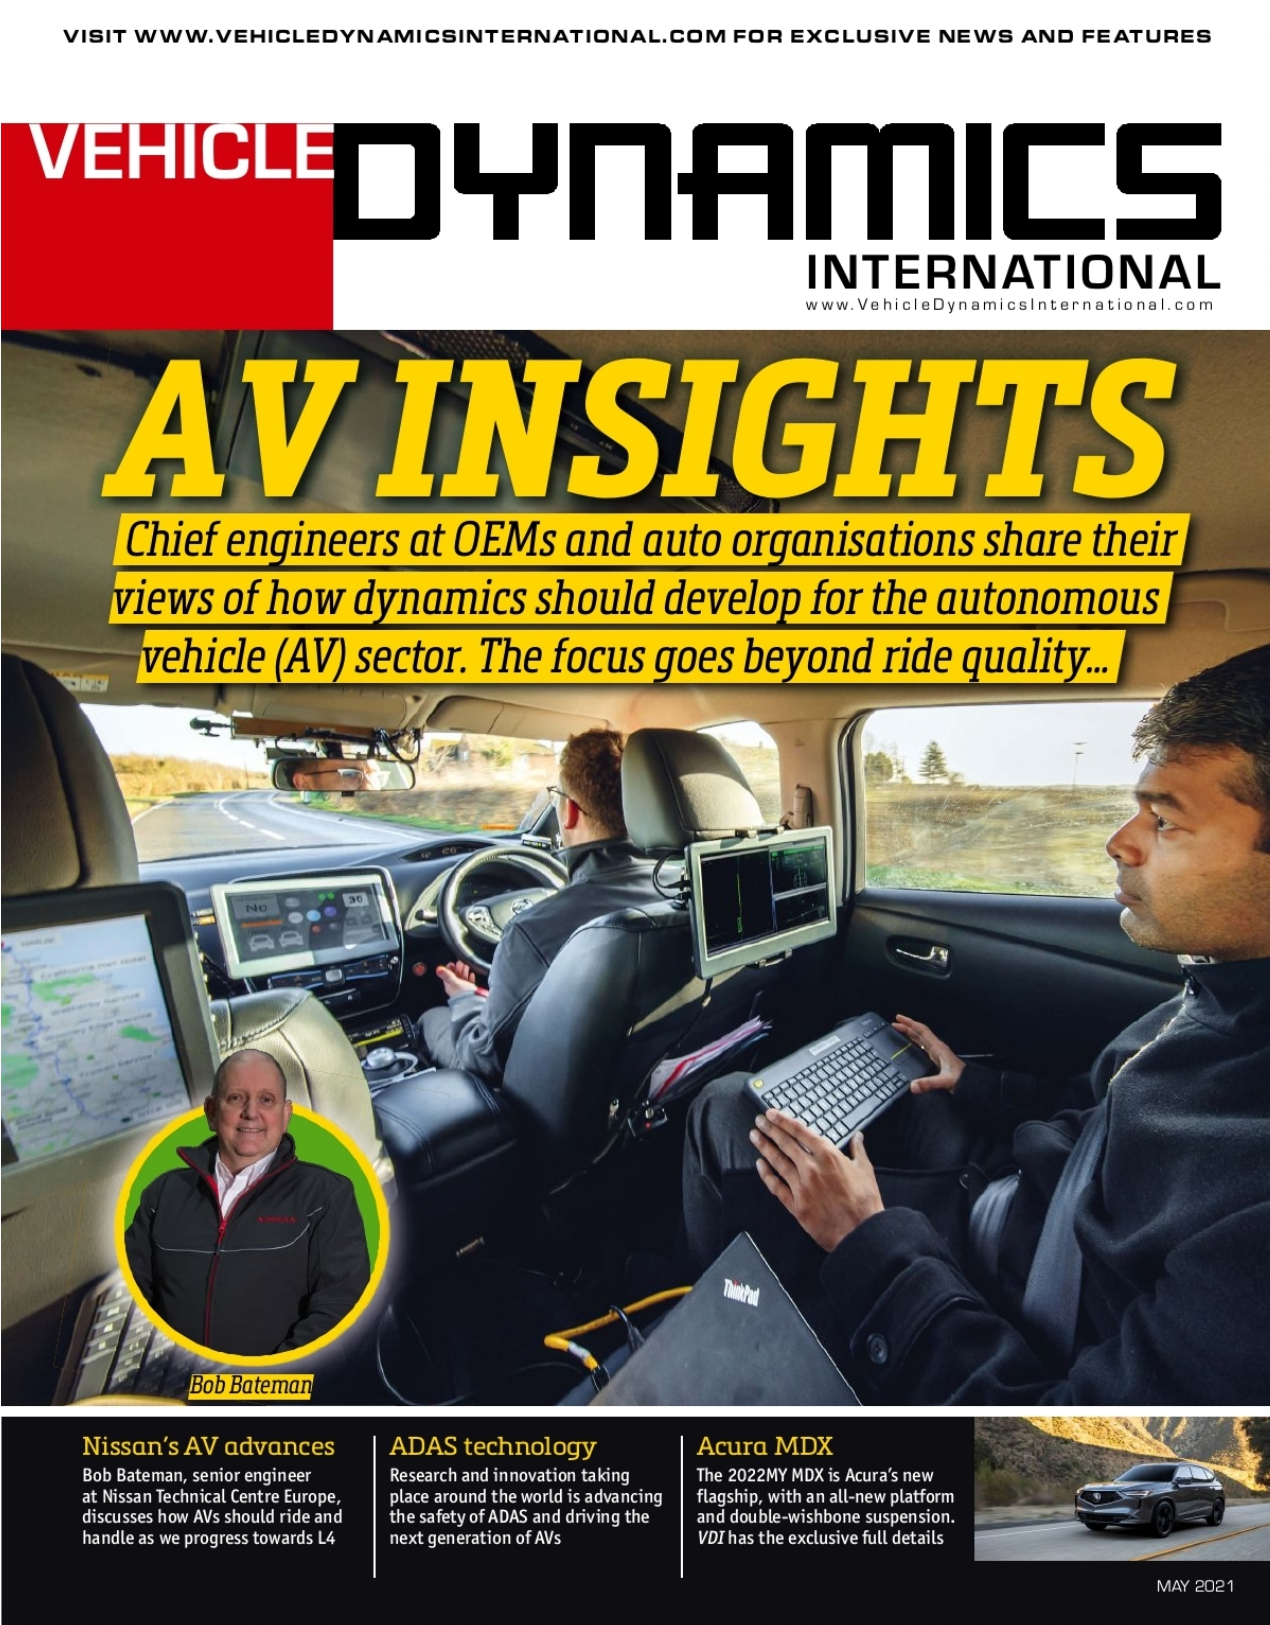 Vehicle Dynamics International May 2021 Cover